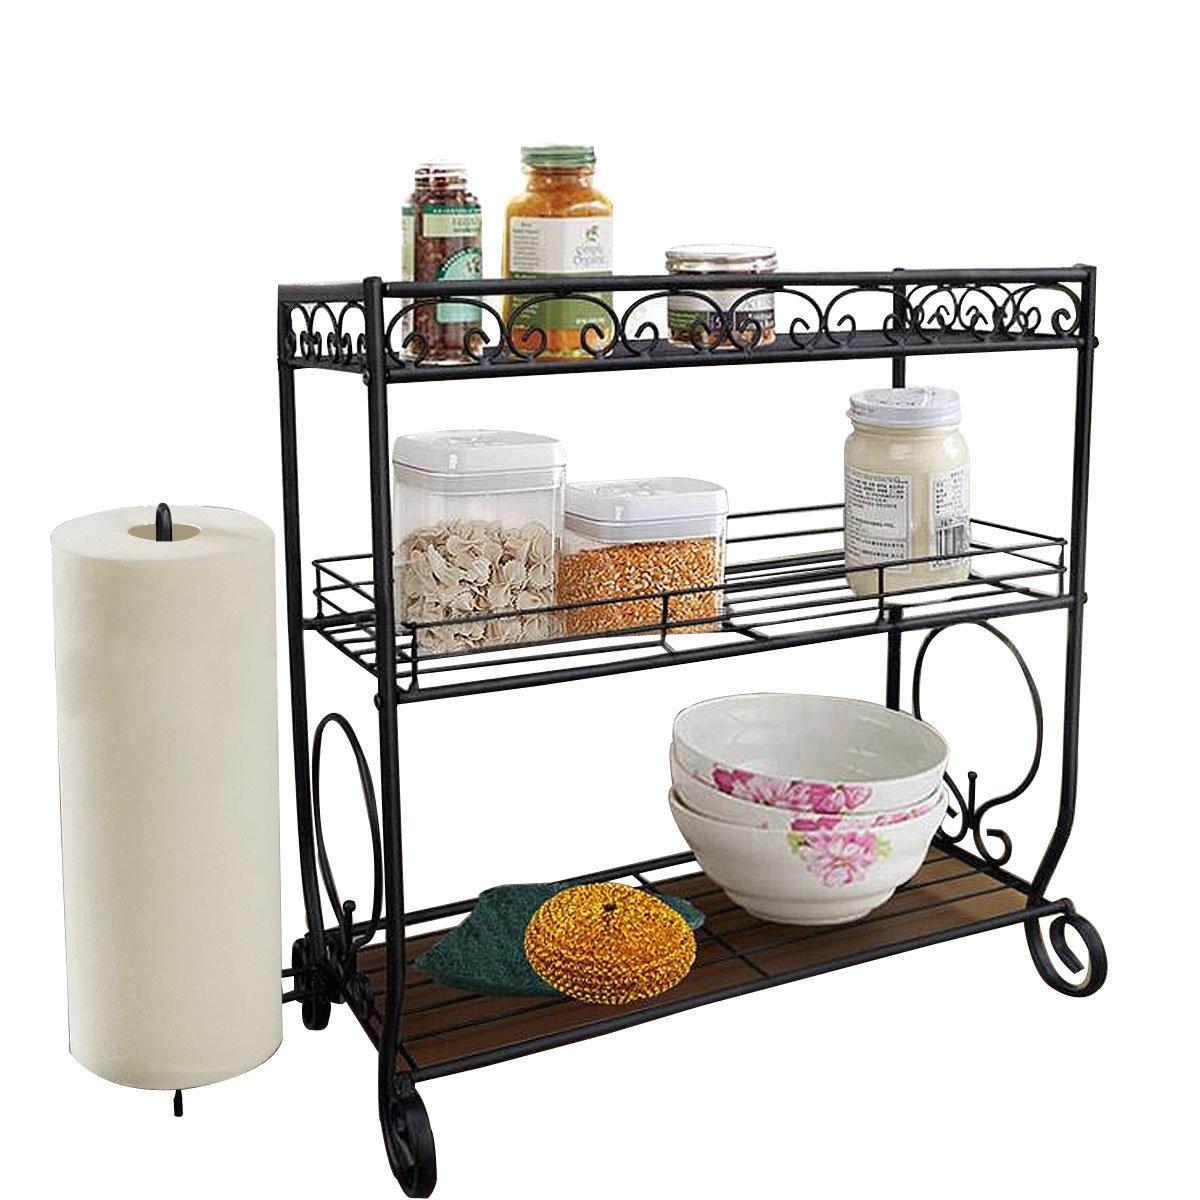 VANRA 3 Tier Spice Rack Kitchen Spice Stand Holder Jars Storage Organizer Shelf Rack with Tissue Dispenser Rack / Bathroom Paper Towel Holder & Towel Bar (Black) COMINHKPR135049